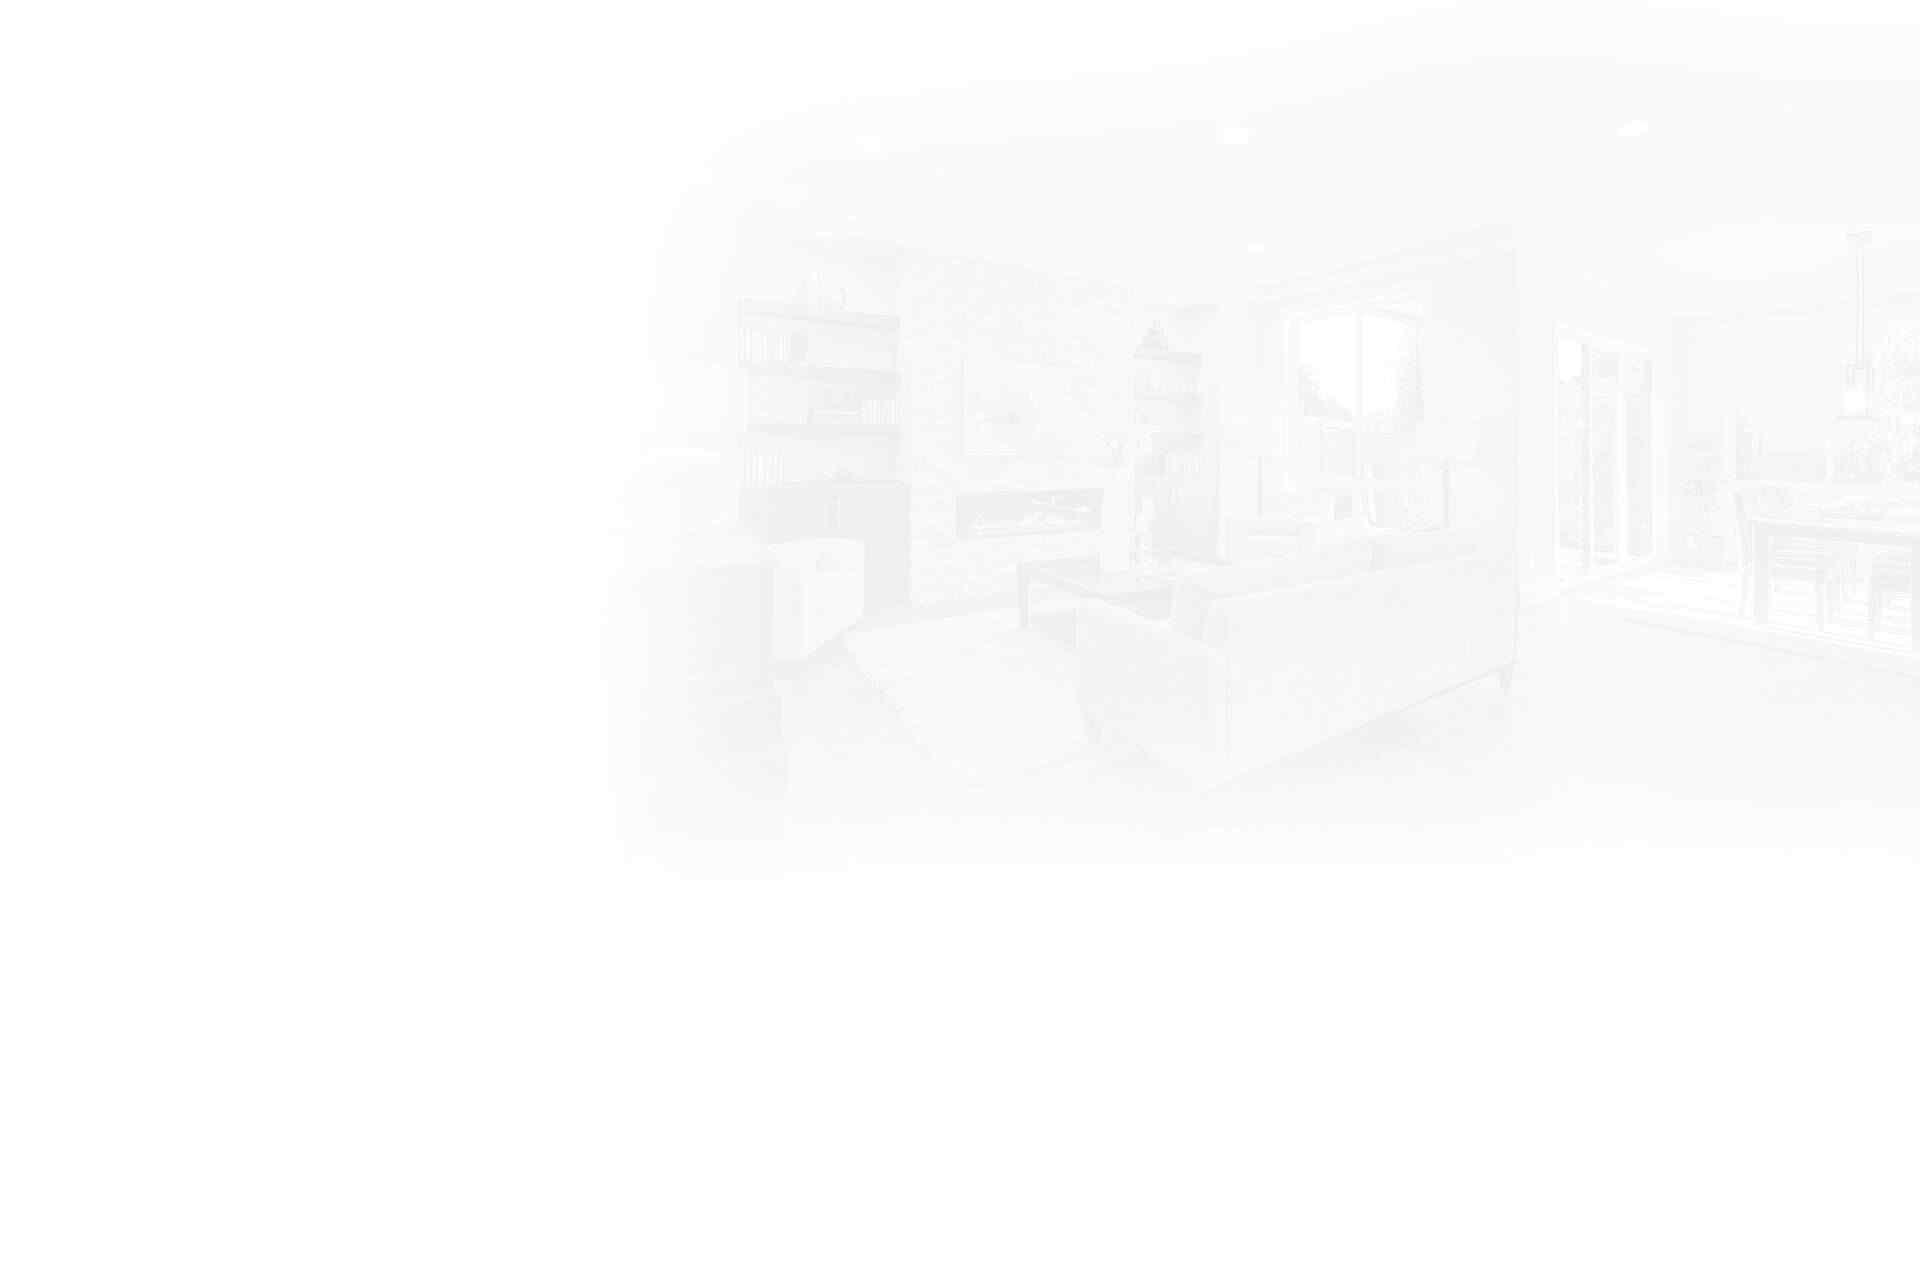 https://nolascoplumbing.com/wp-content/uploads/2018/10/background_grayscale_03.jpg